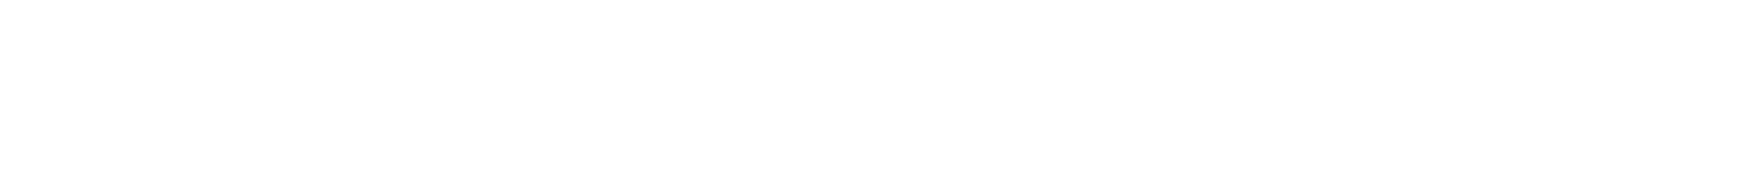 Superdiscounts-logo